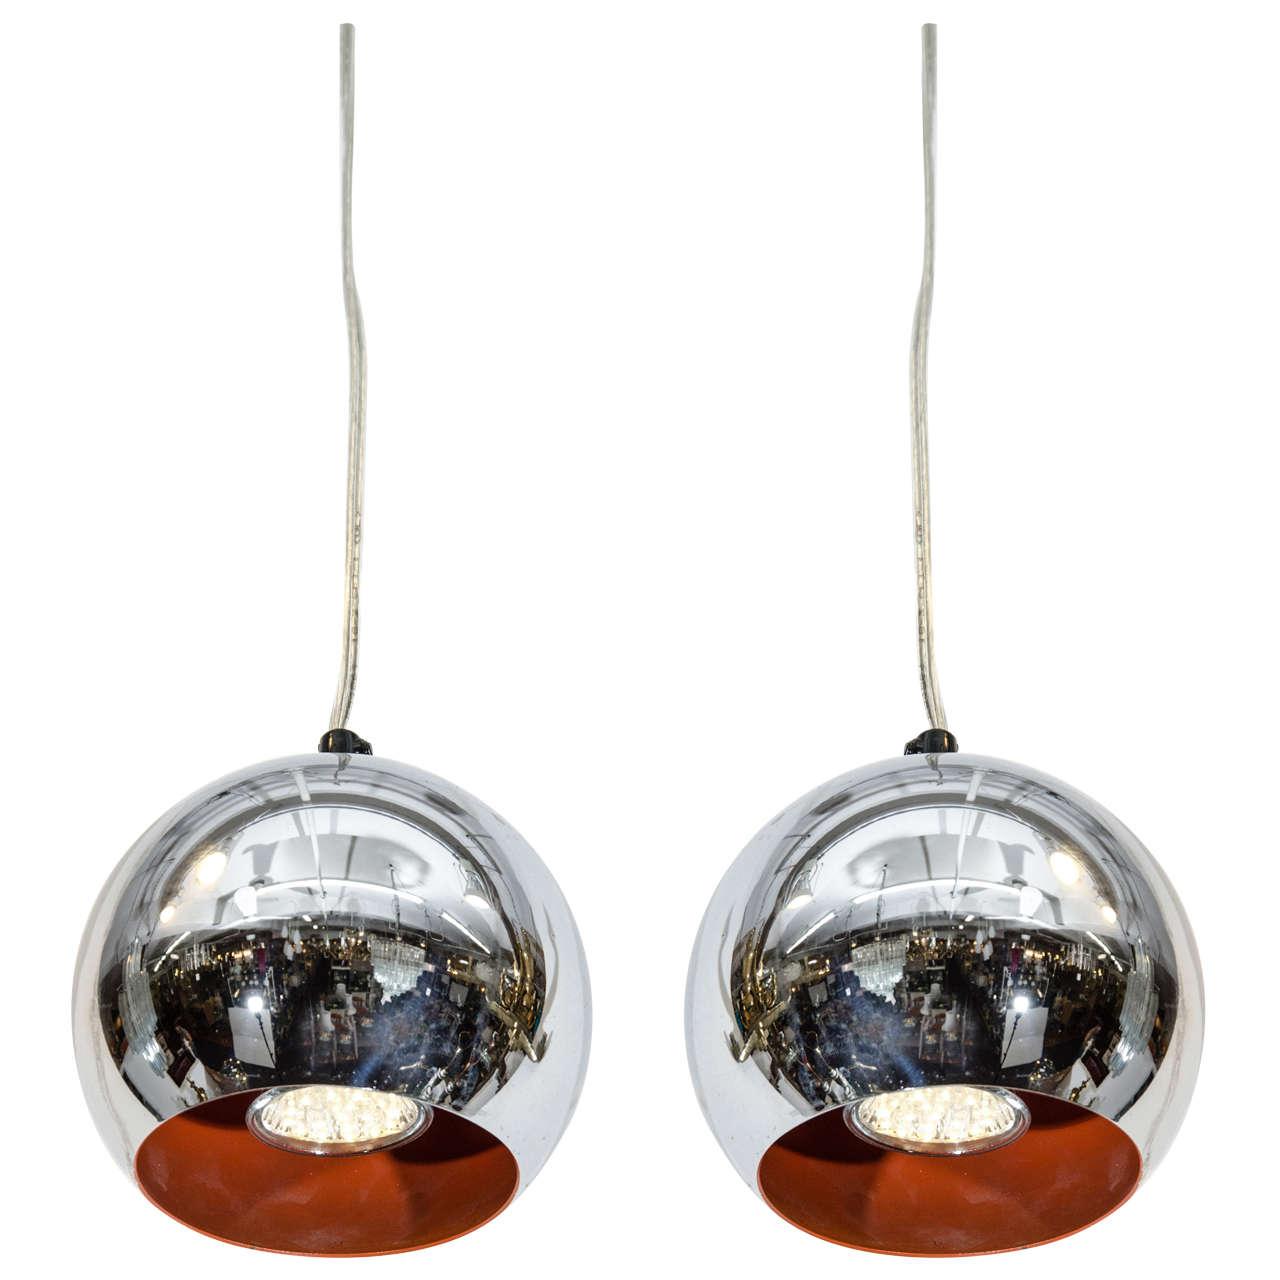 Mid Century Modern Chrome Ball Pendant Lights After Verner Panton For